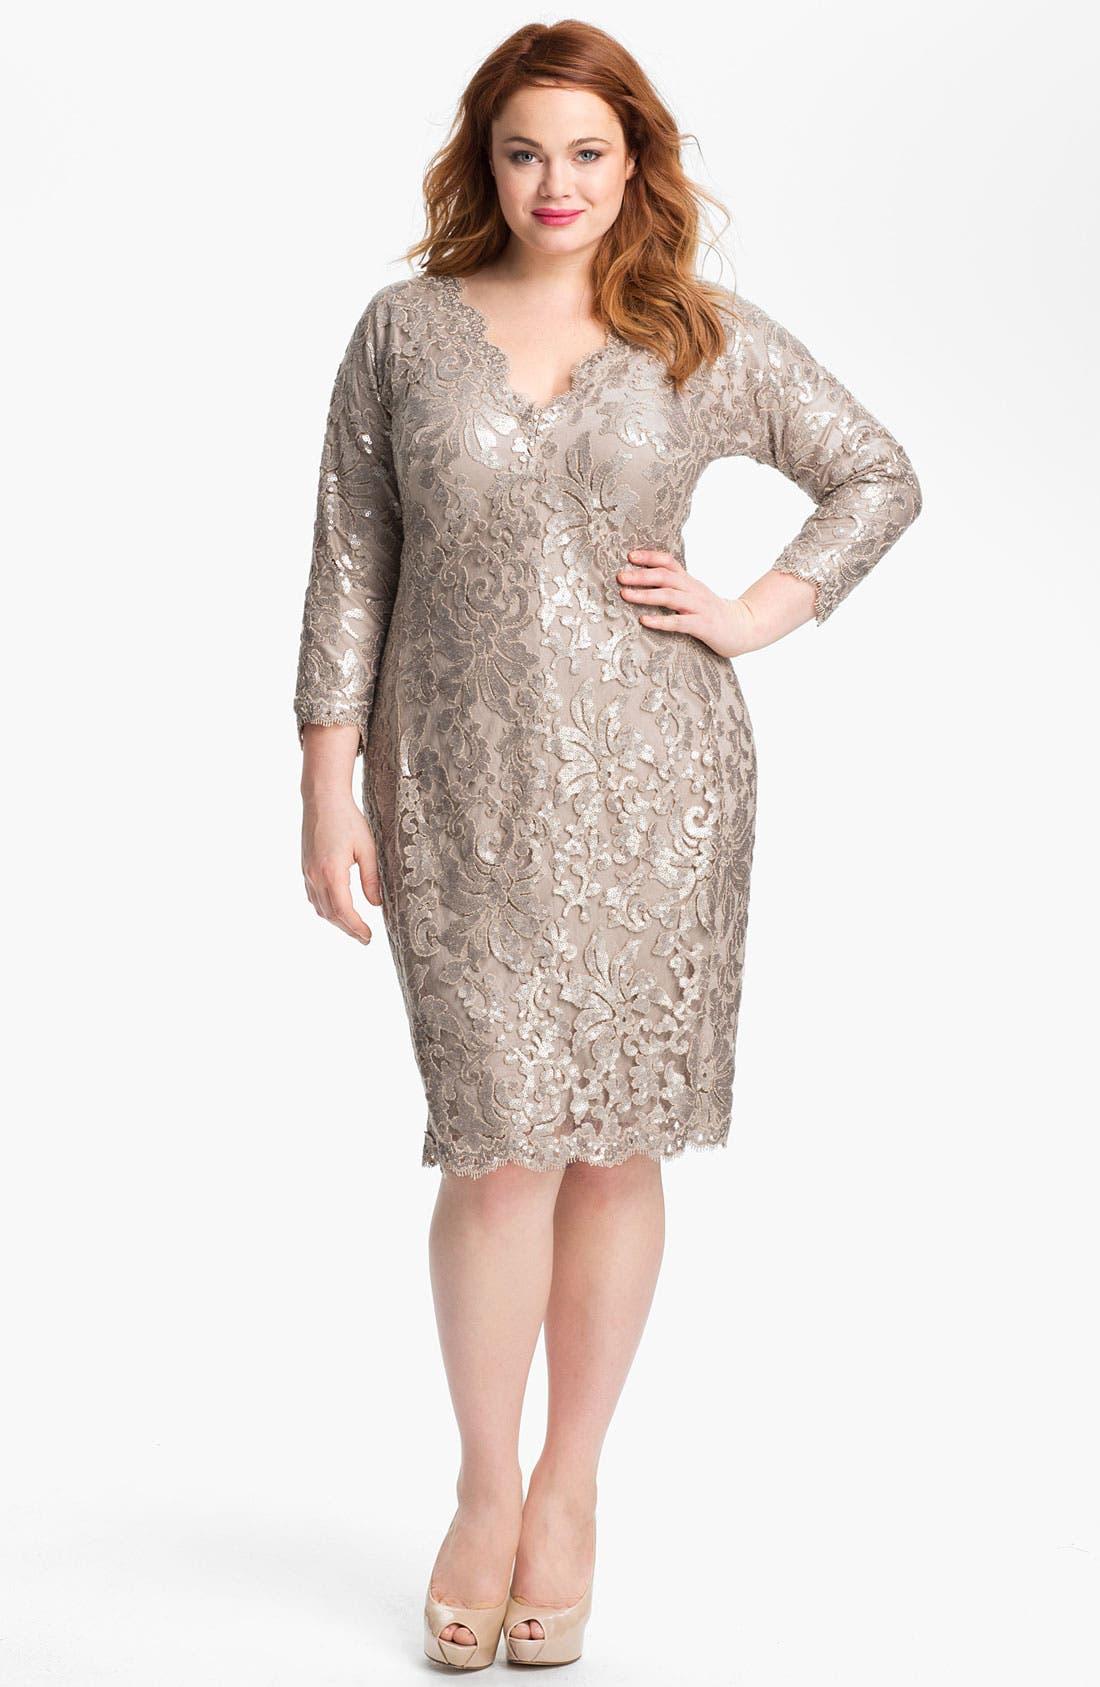 Alternate Image 1 Selected - Tadashi Shoji Metallic Jacquard Tulle & Lace Dress (Plus Size)